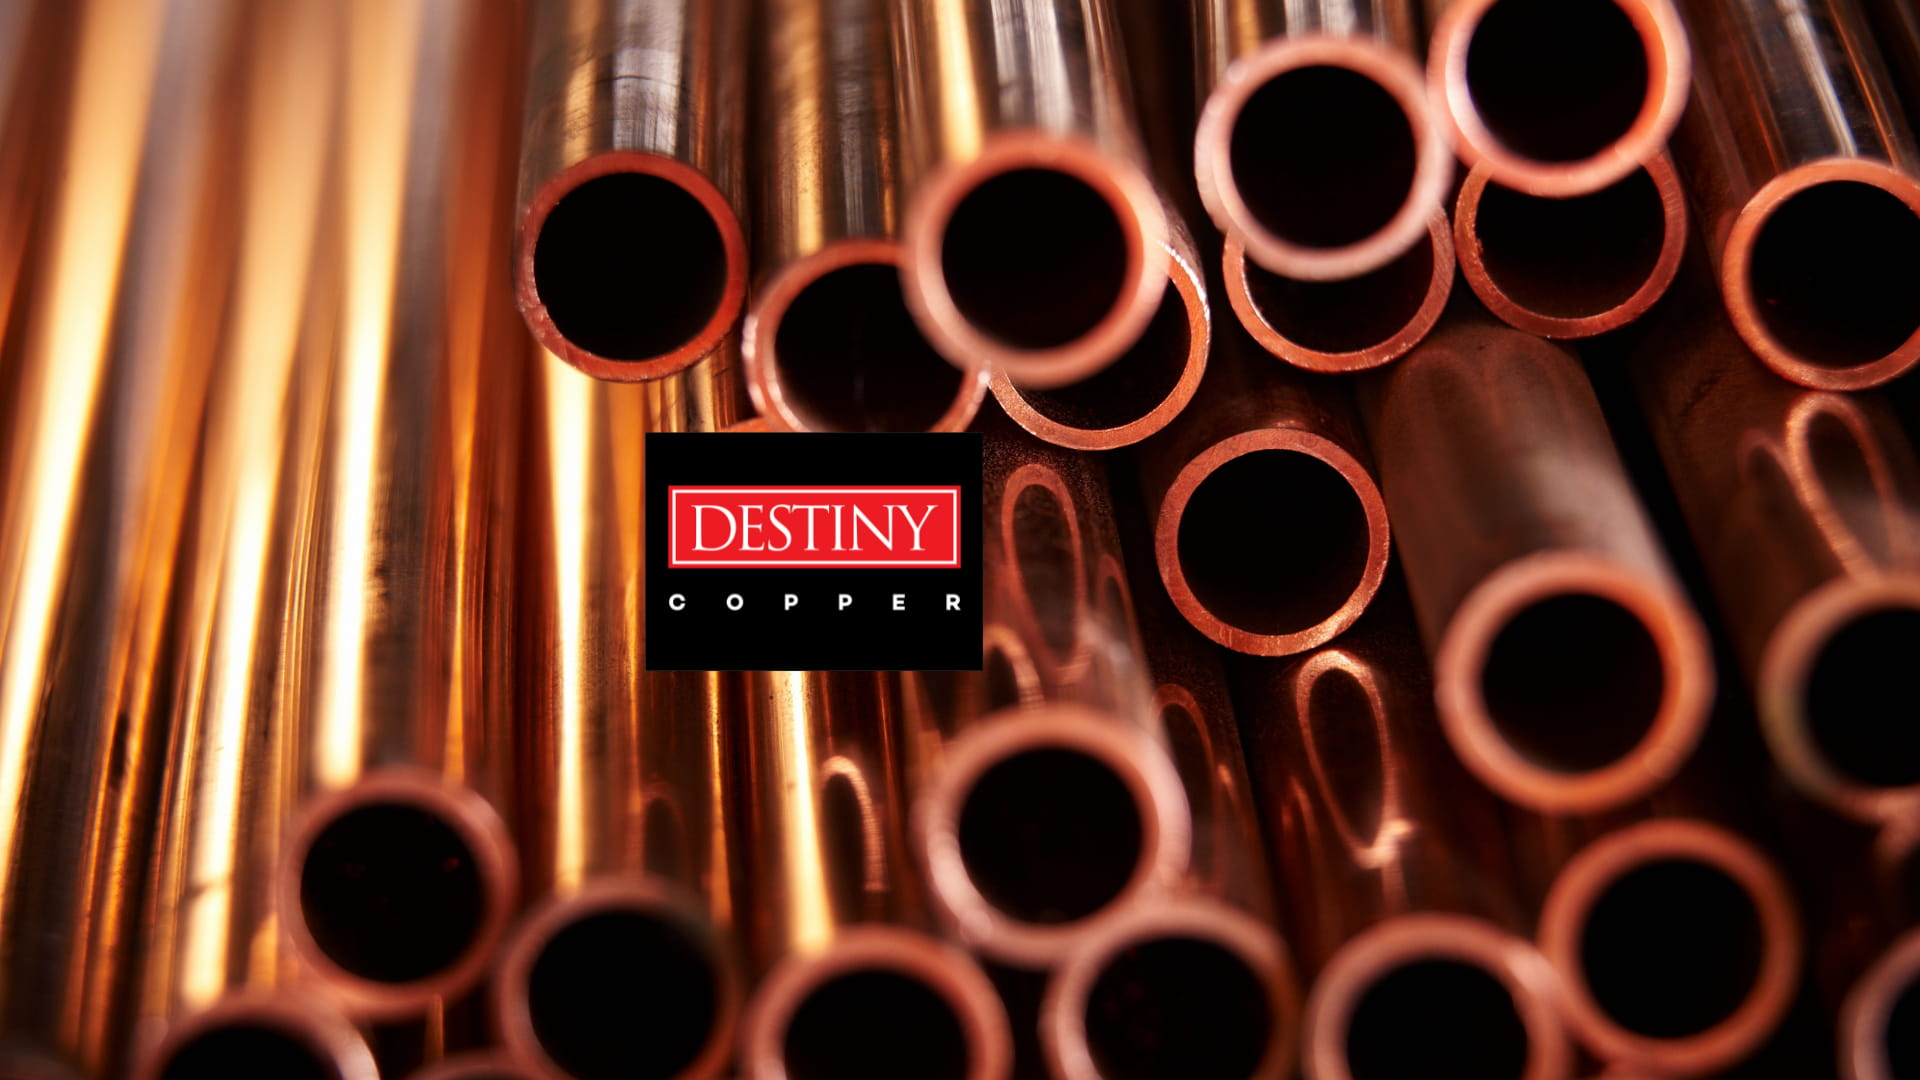 Interakt Client background - Destiny Copper